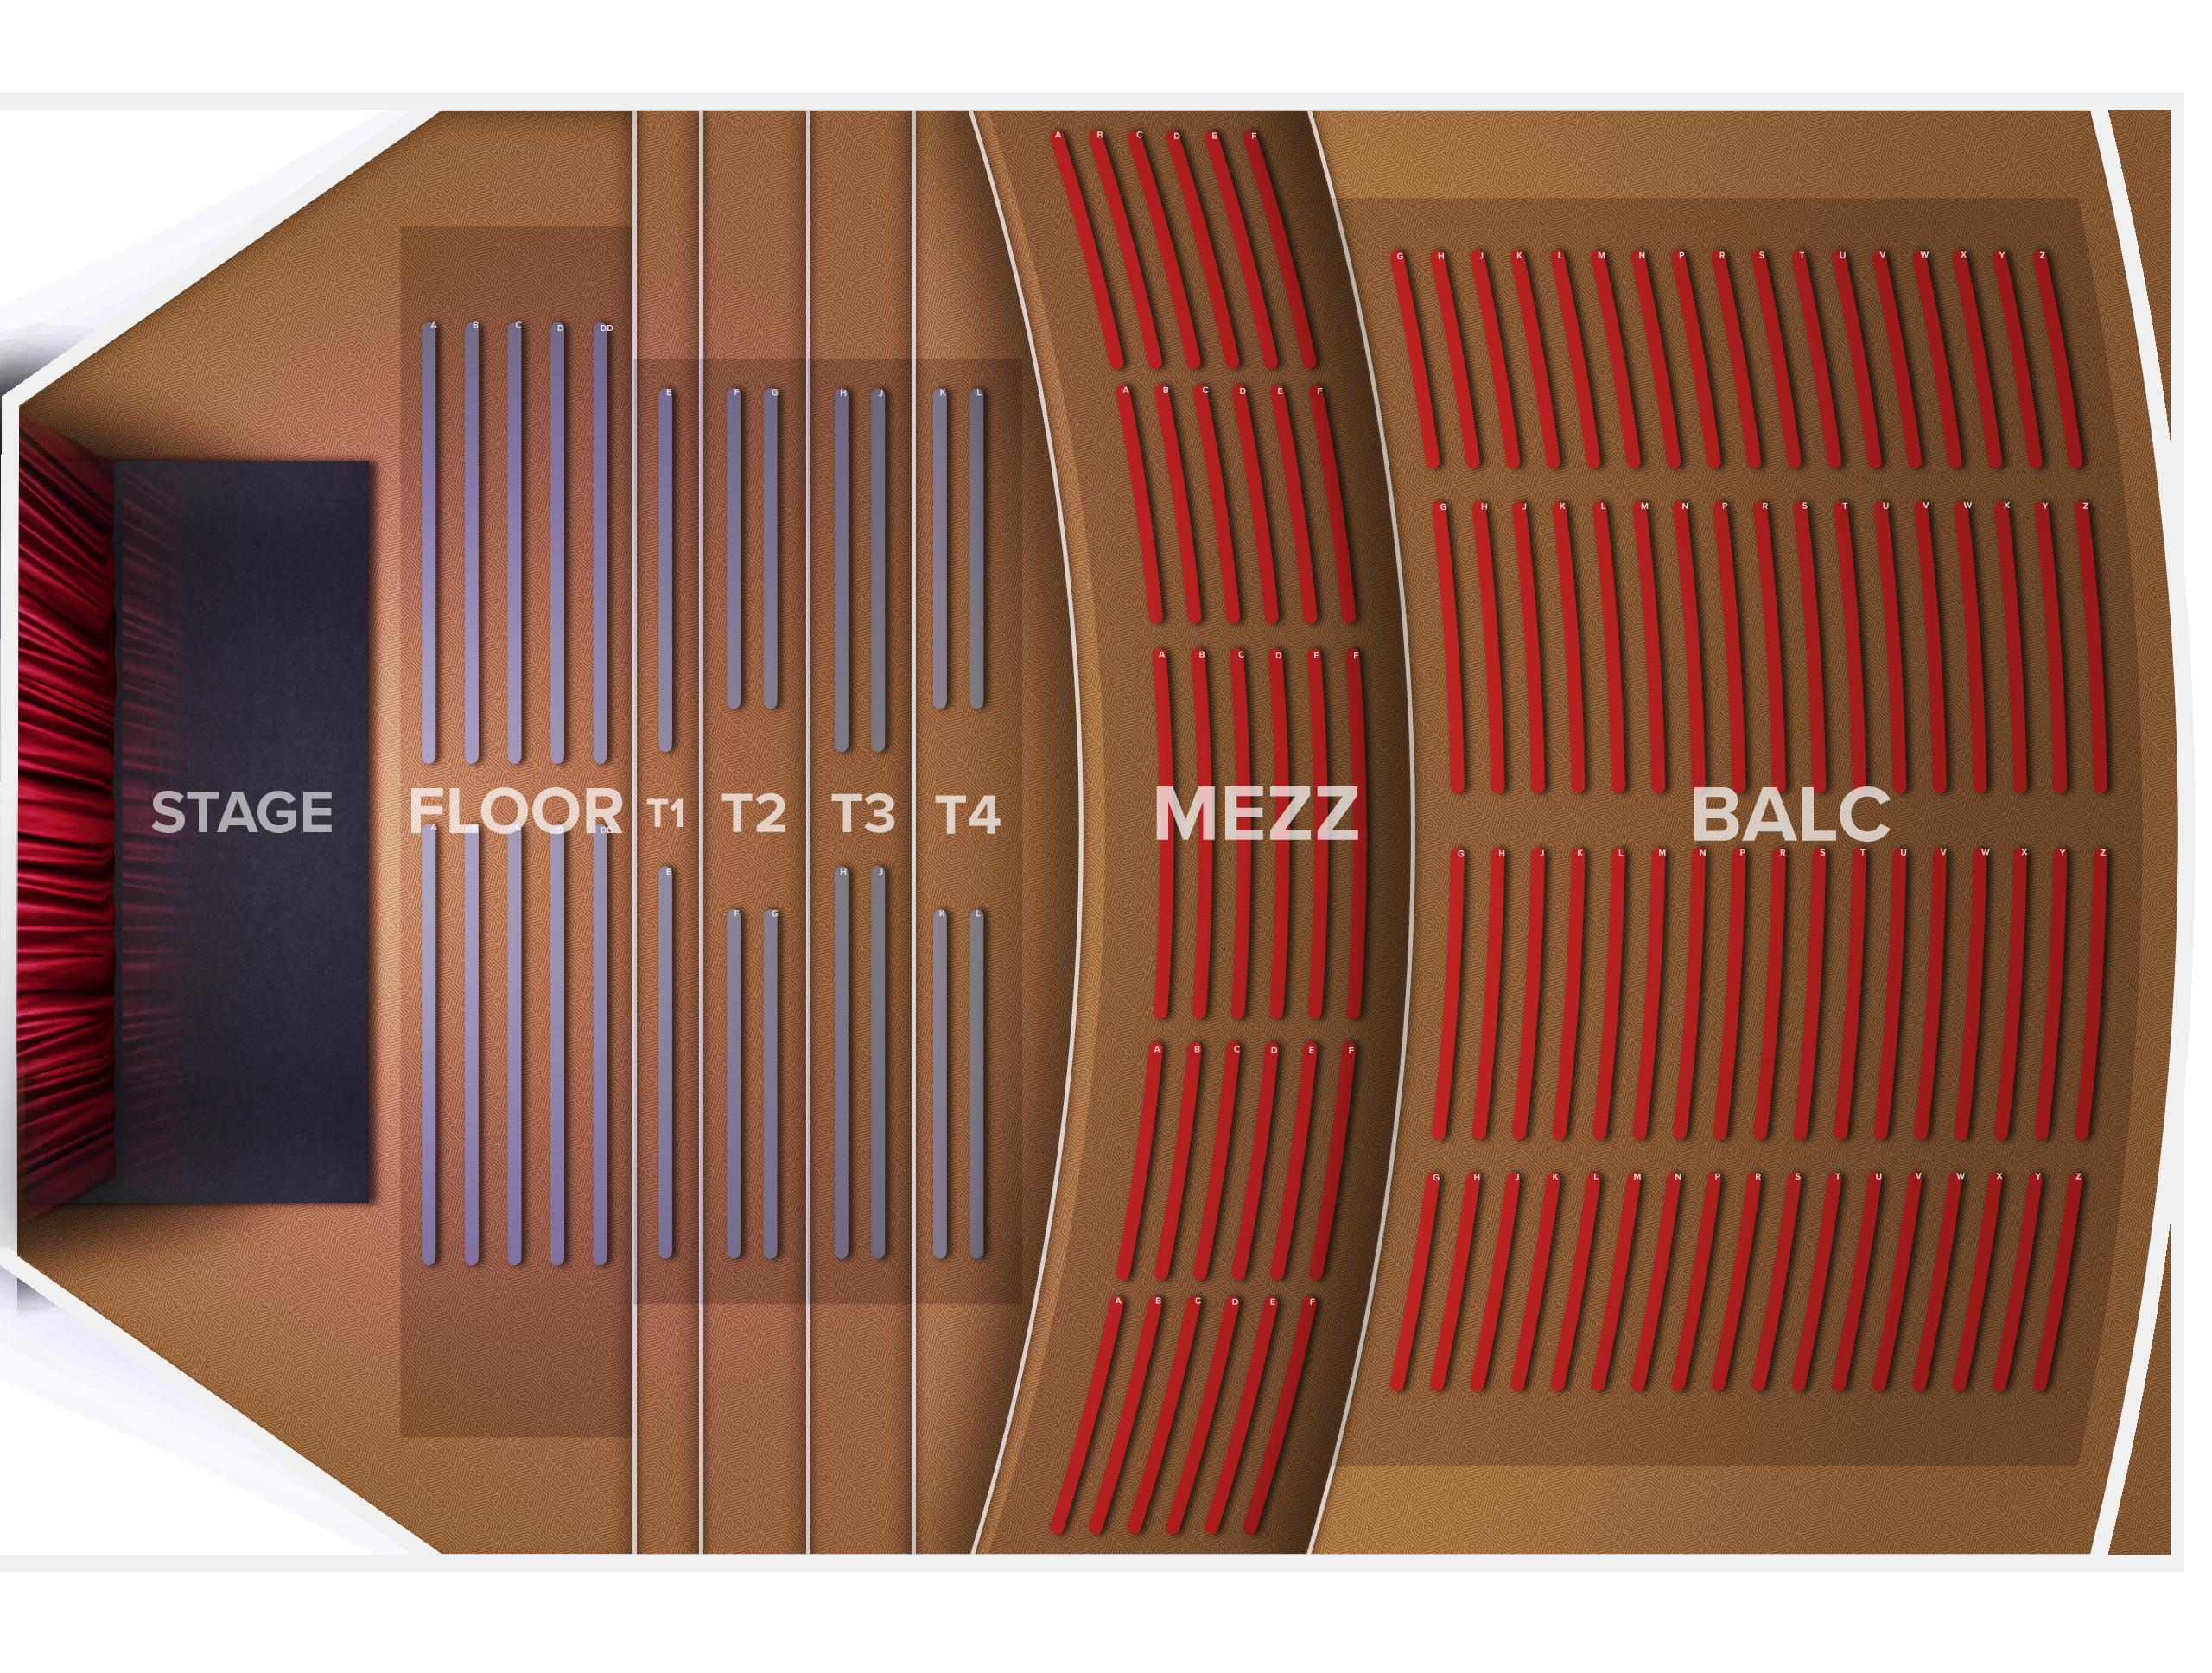 Aztec Theatre Tickets